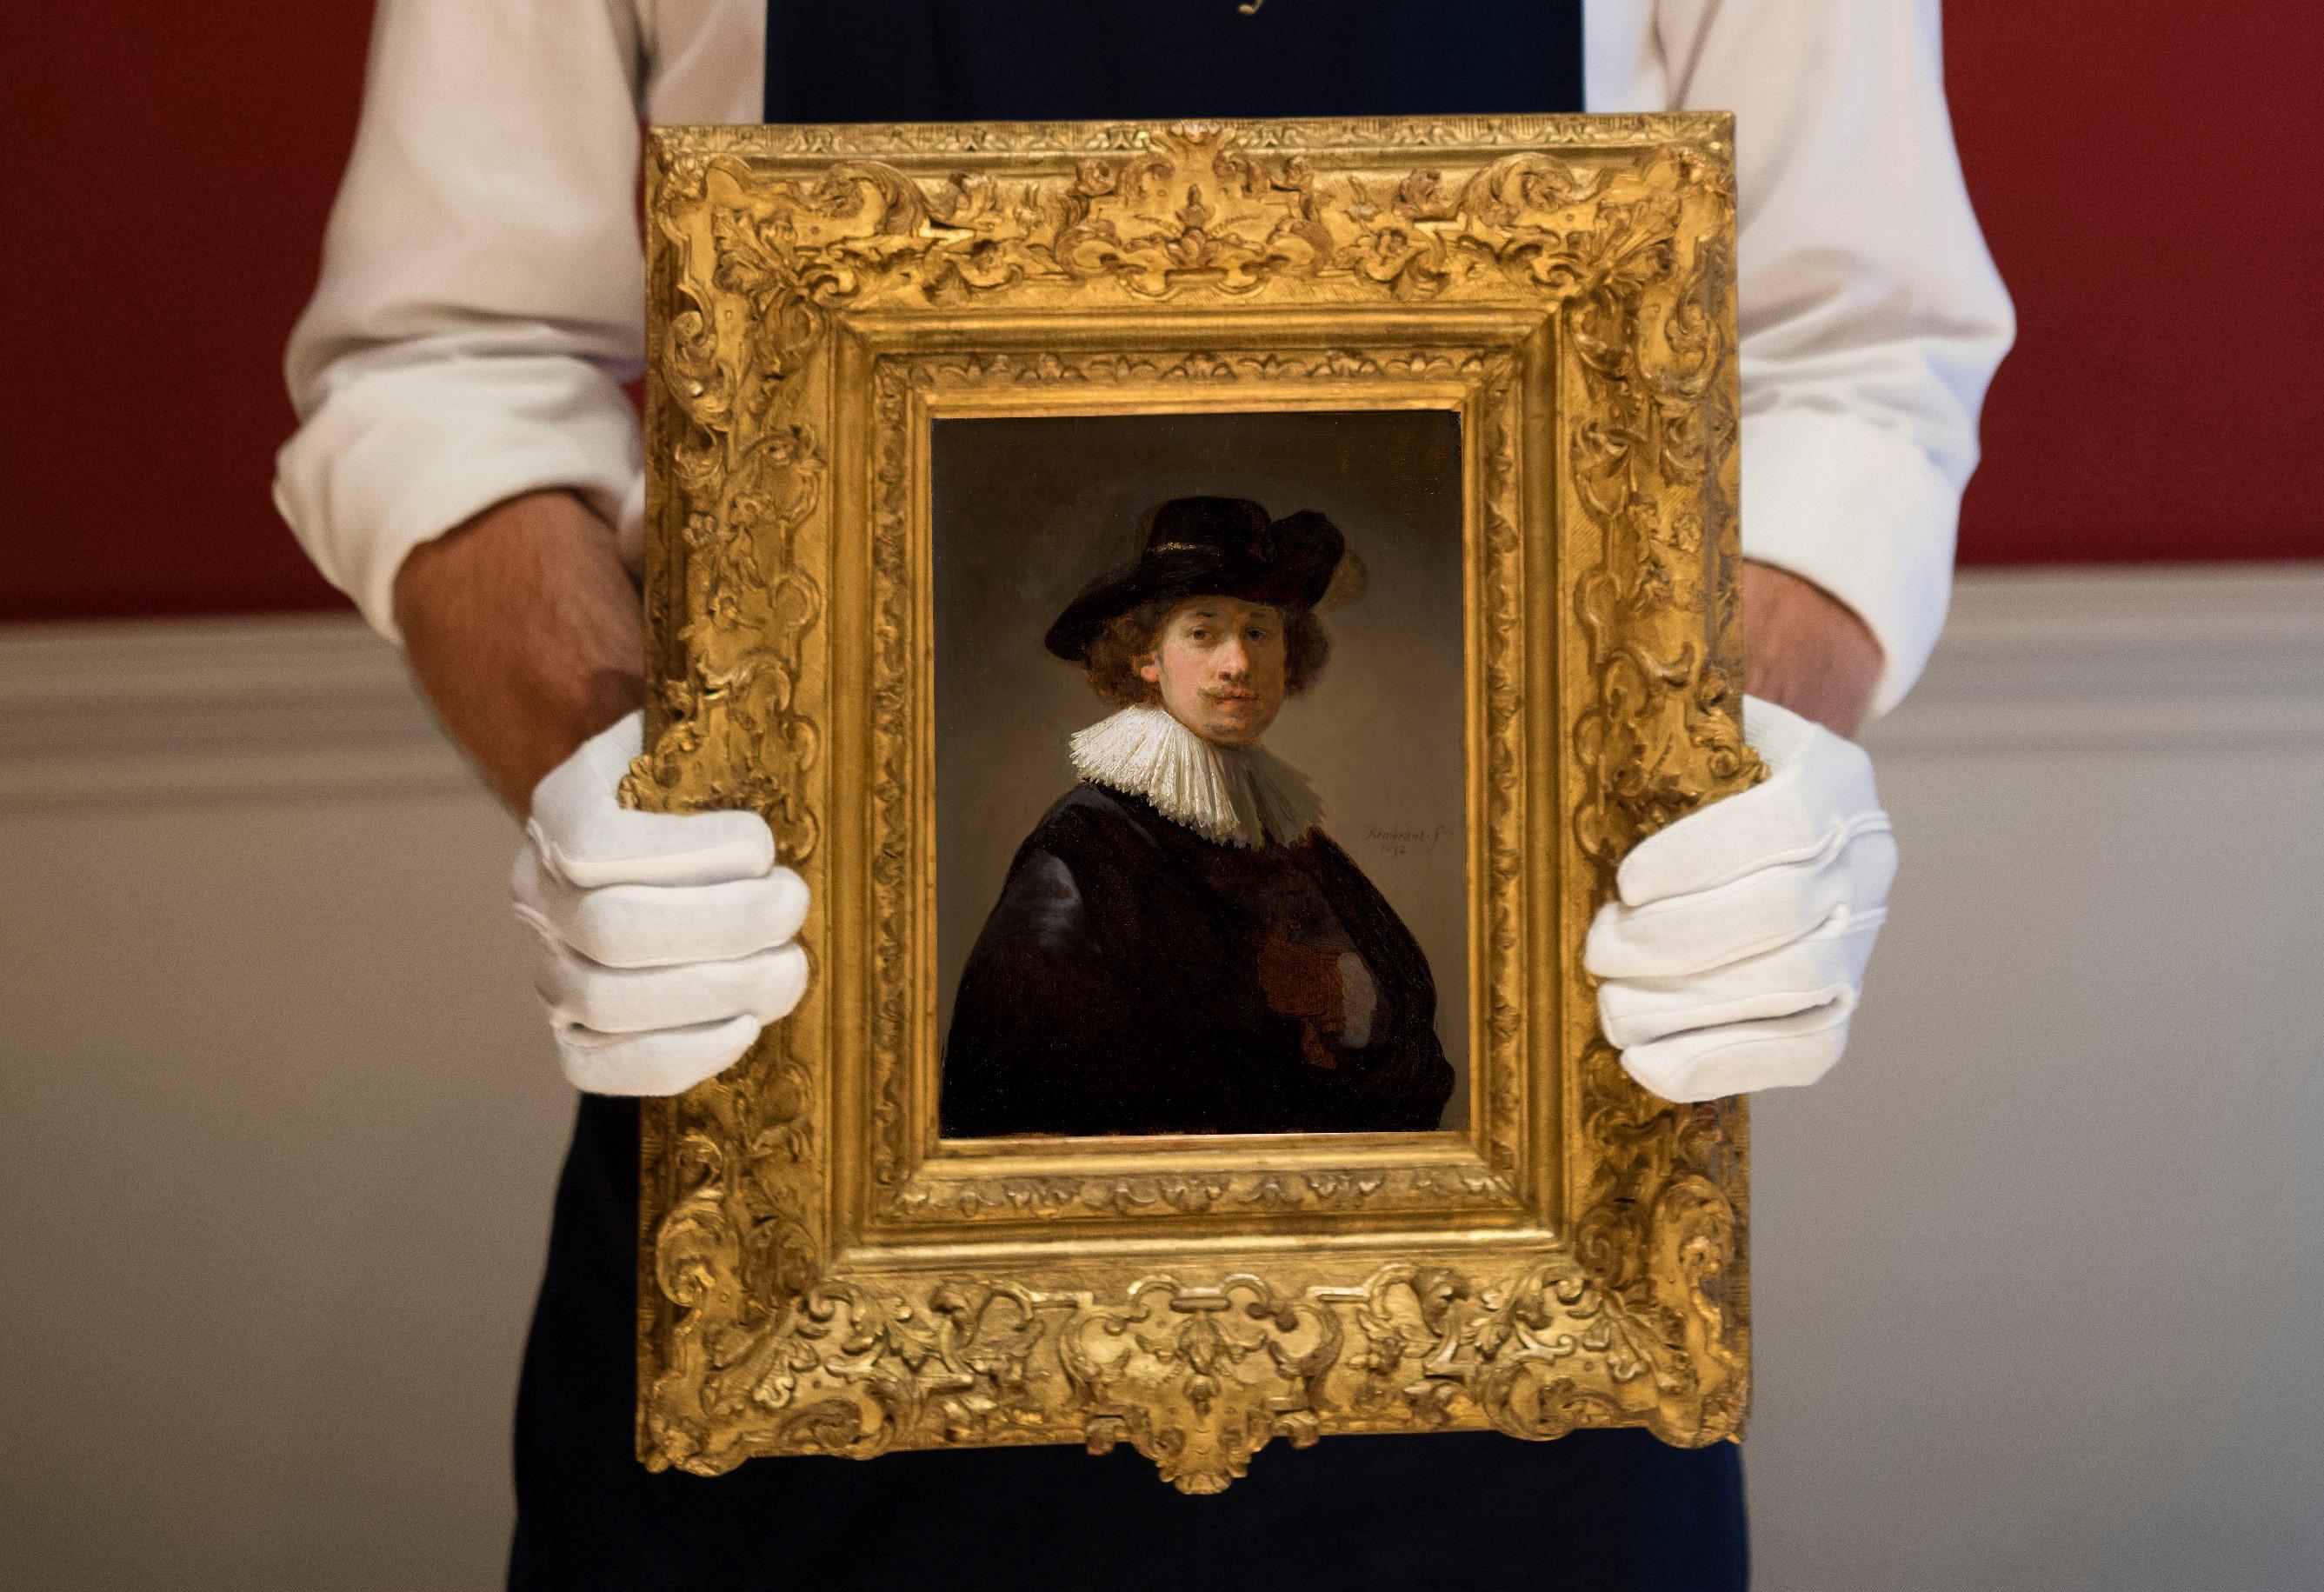 Rembrandt Van Rijn, Self-portrait, wearing a ruff and black hat, 1632, est £12-16 million ($15-20 million) -Photographer Antony Jones (3)